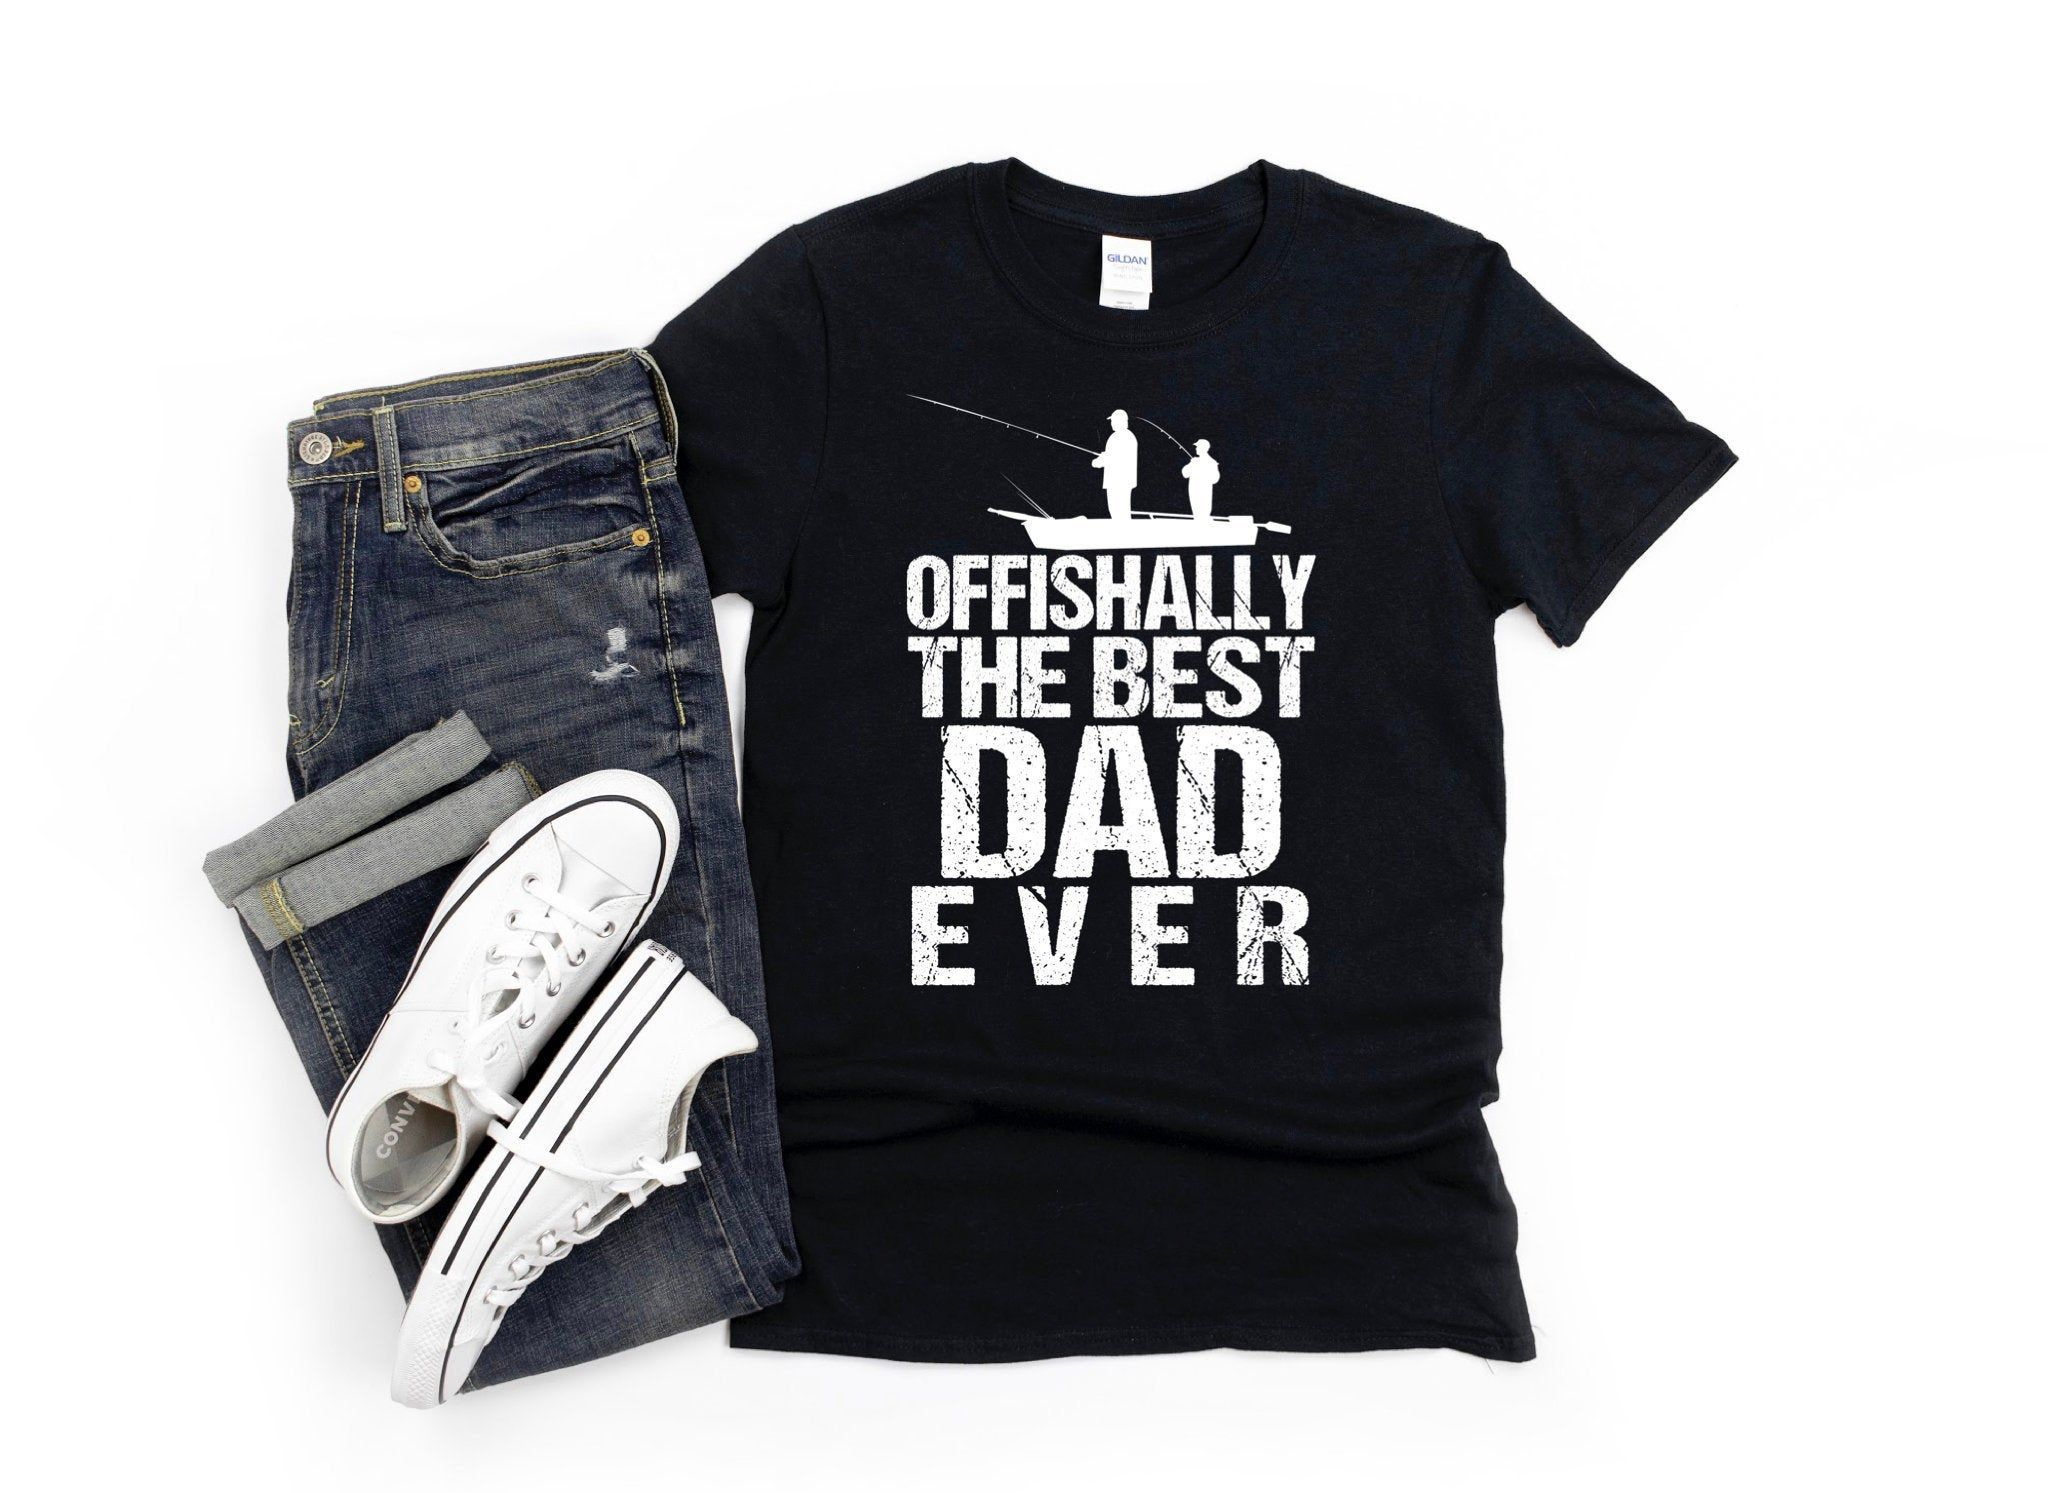 Fun Fishing Dad Shirt Fisherman Dad Tshirt Gift Offishally The